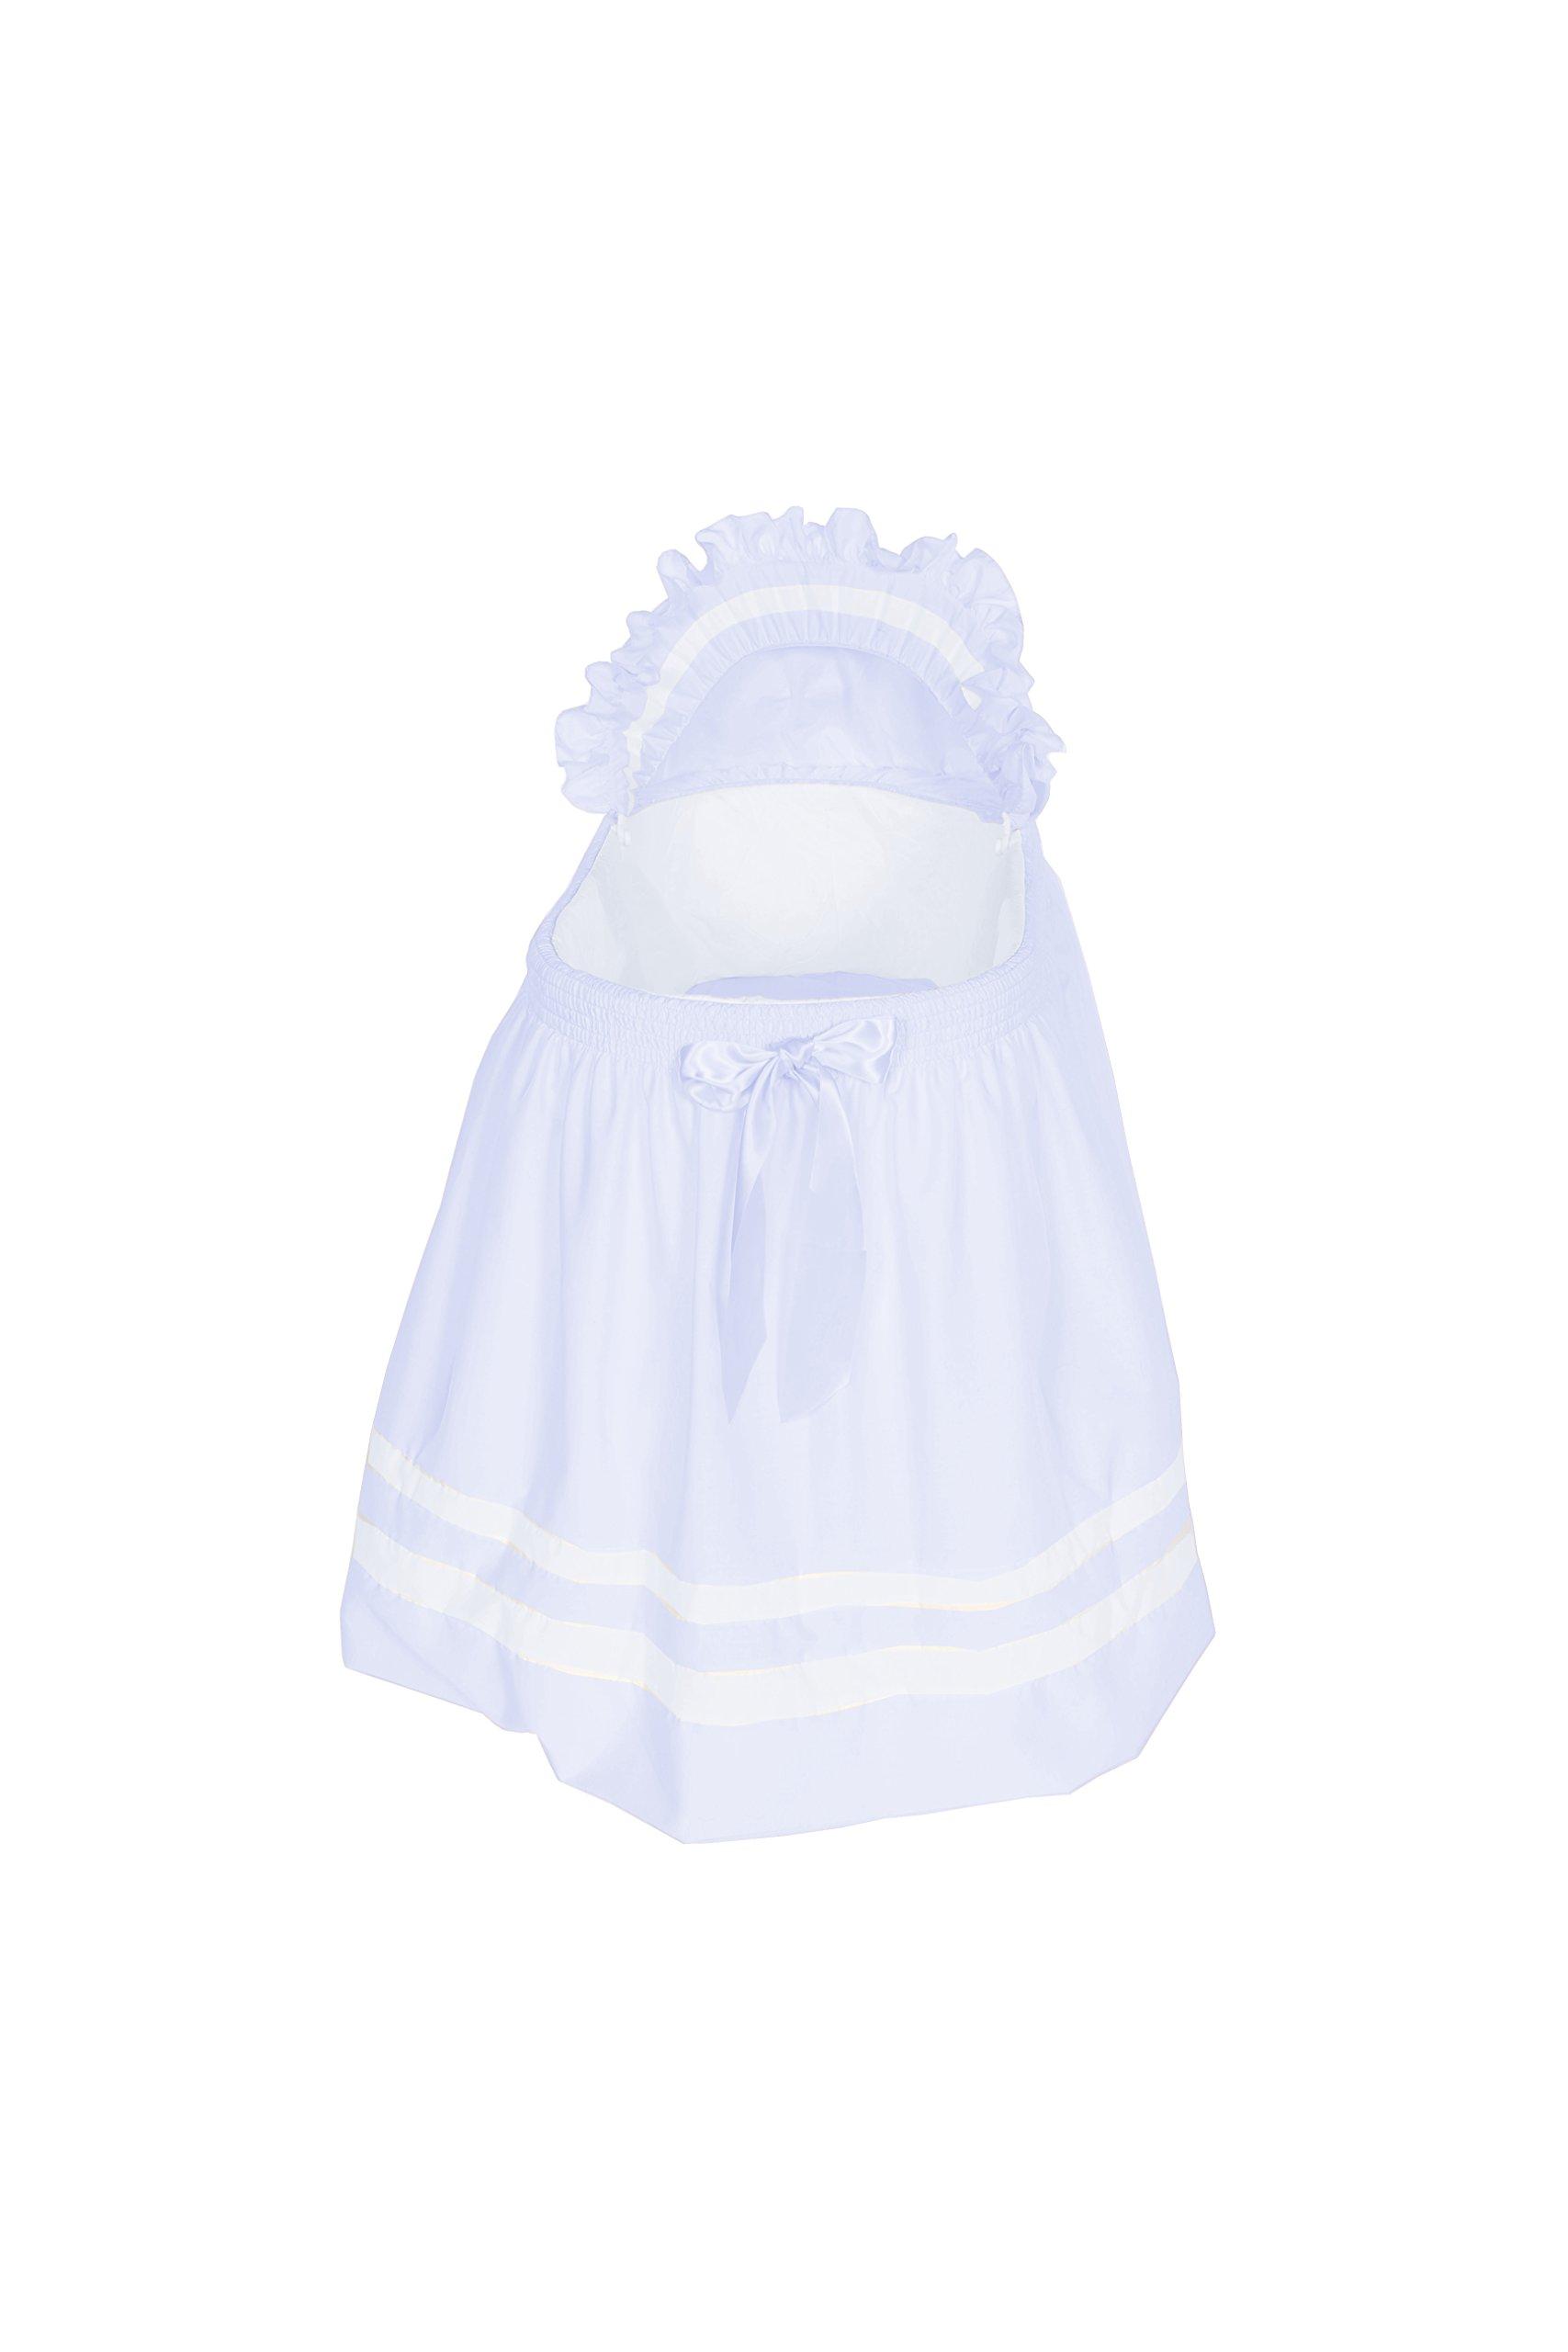 Baby Doll Bedding Modern Hotel Style Bassinet Liner, Blue by BabyDoll Bedding